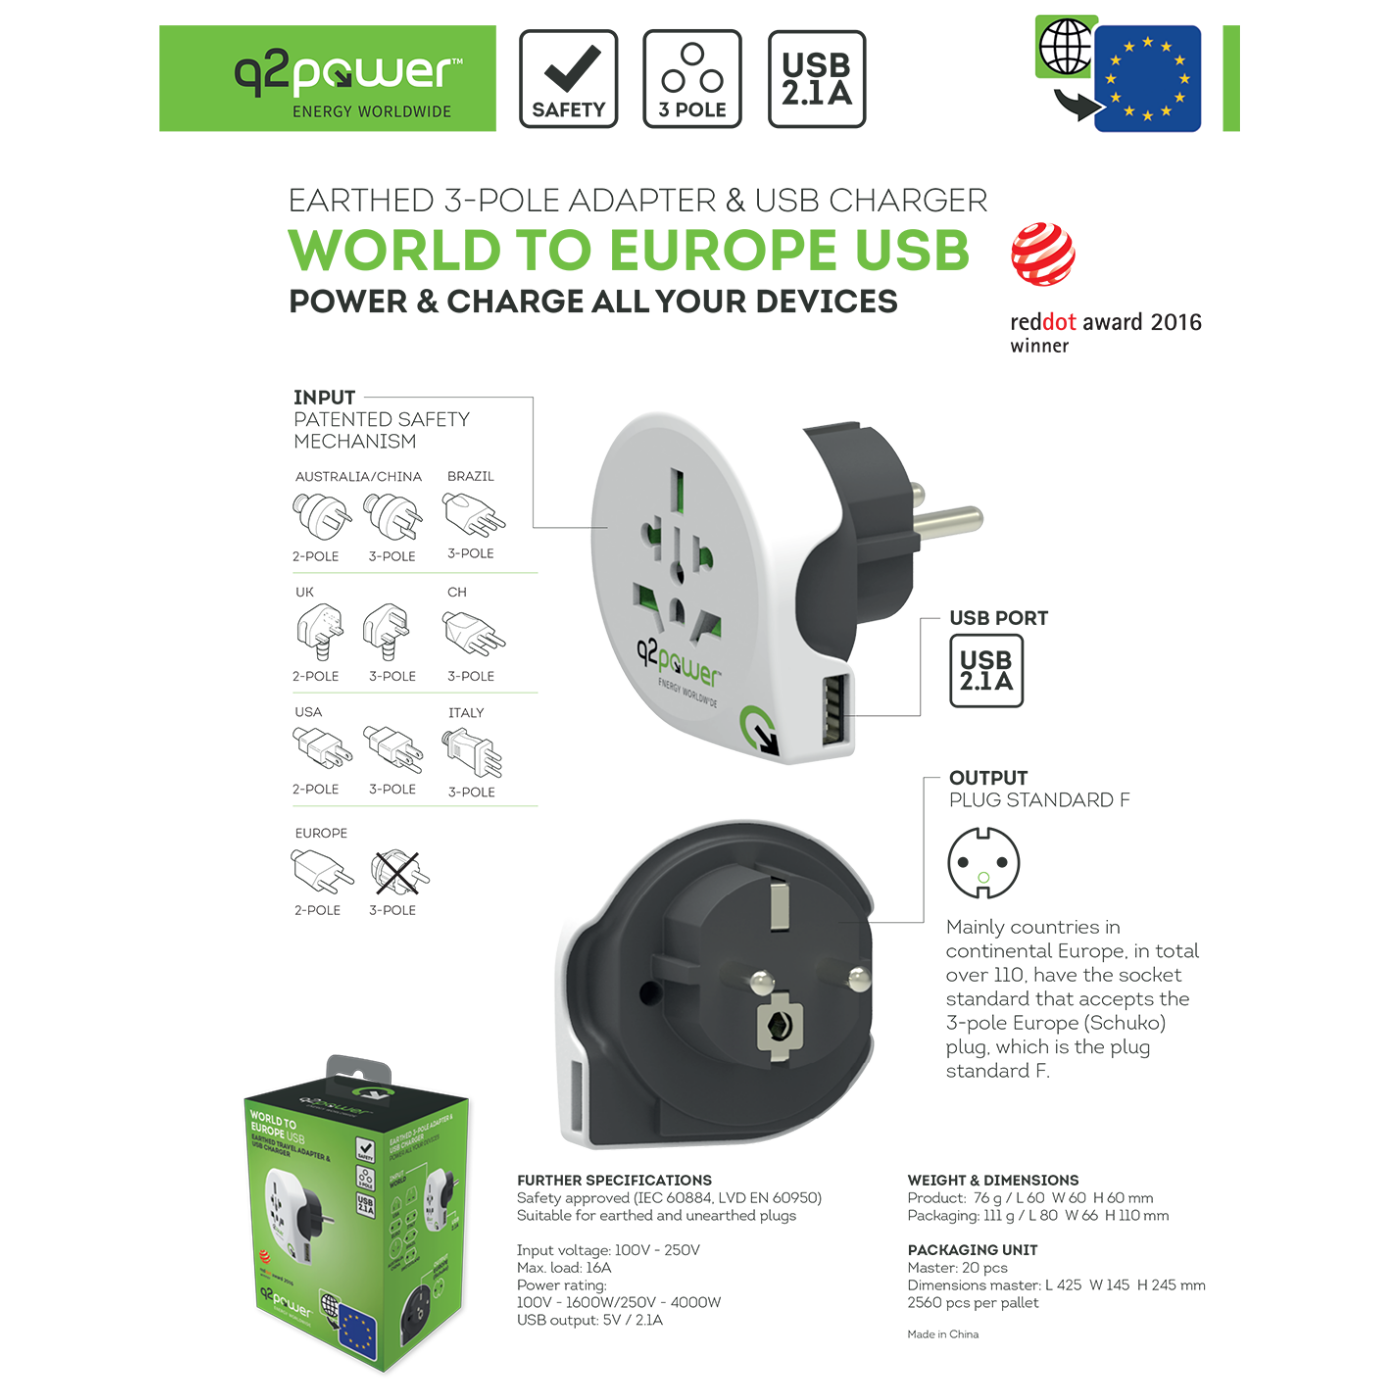 WORLD TO EUROPE USB